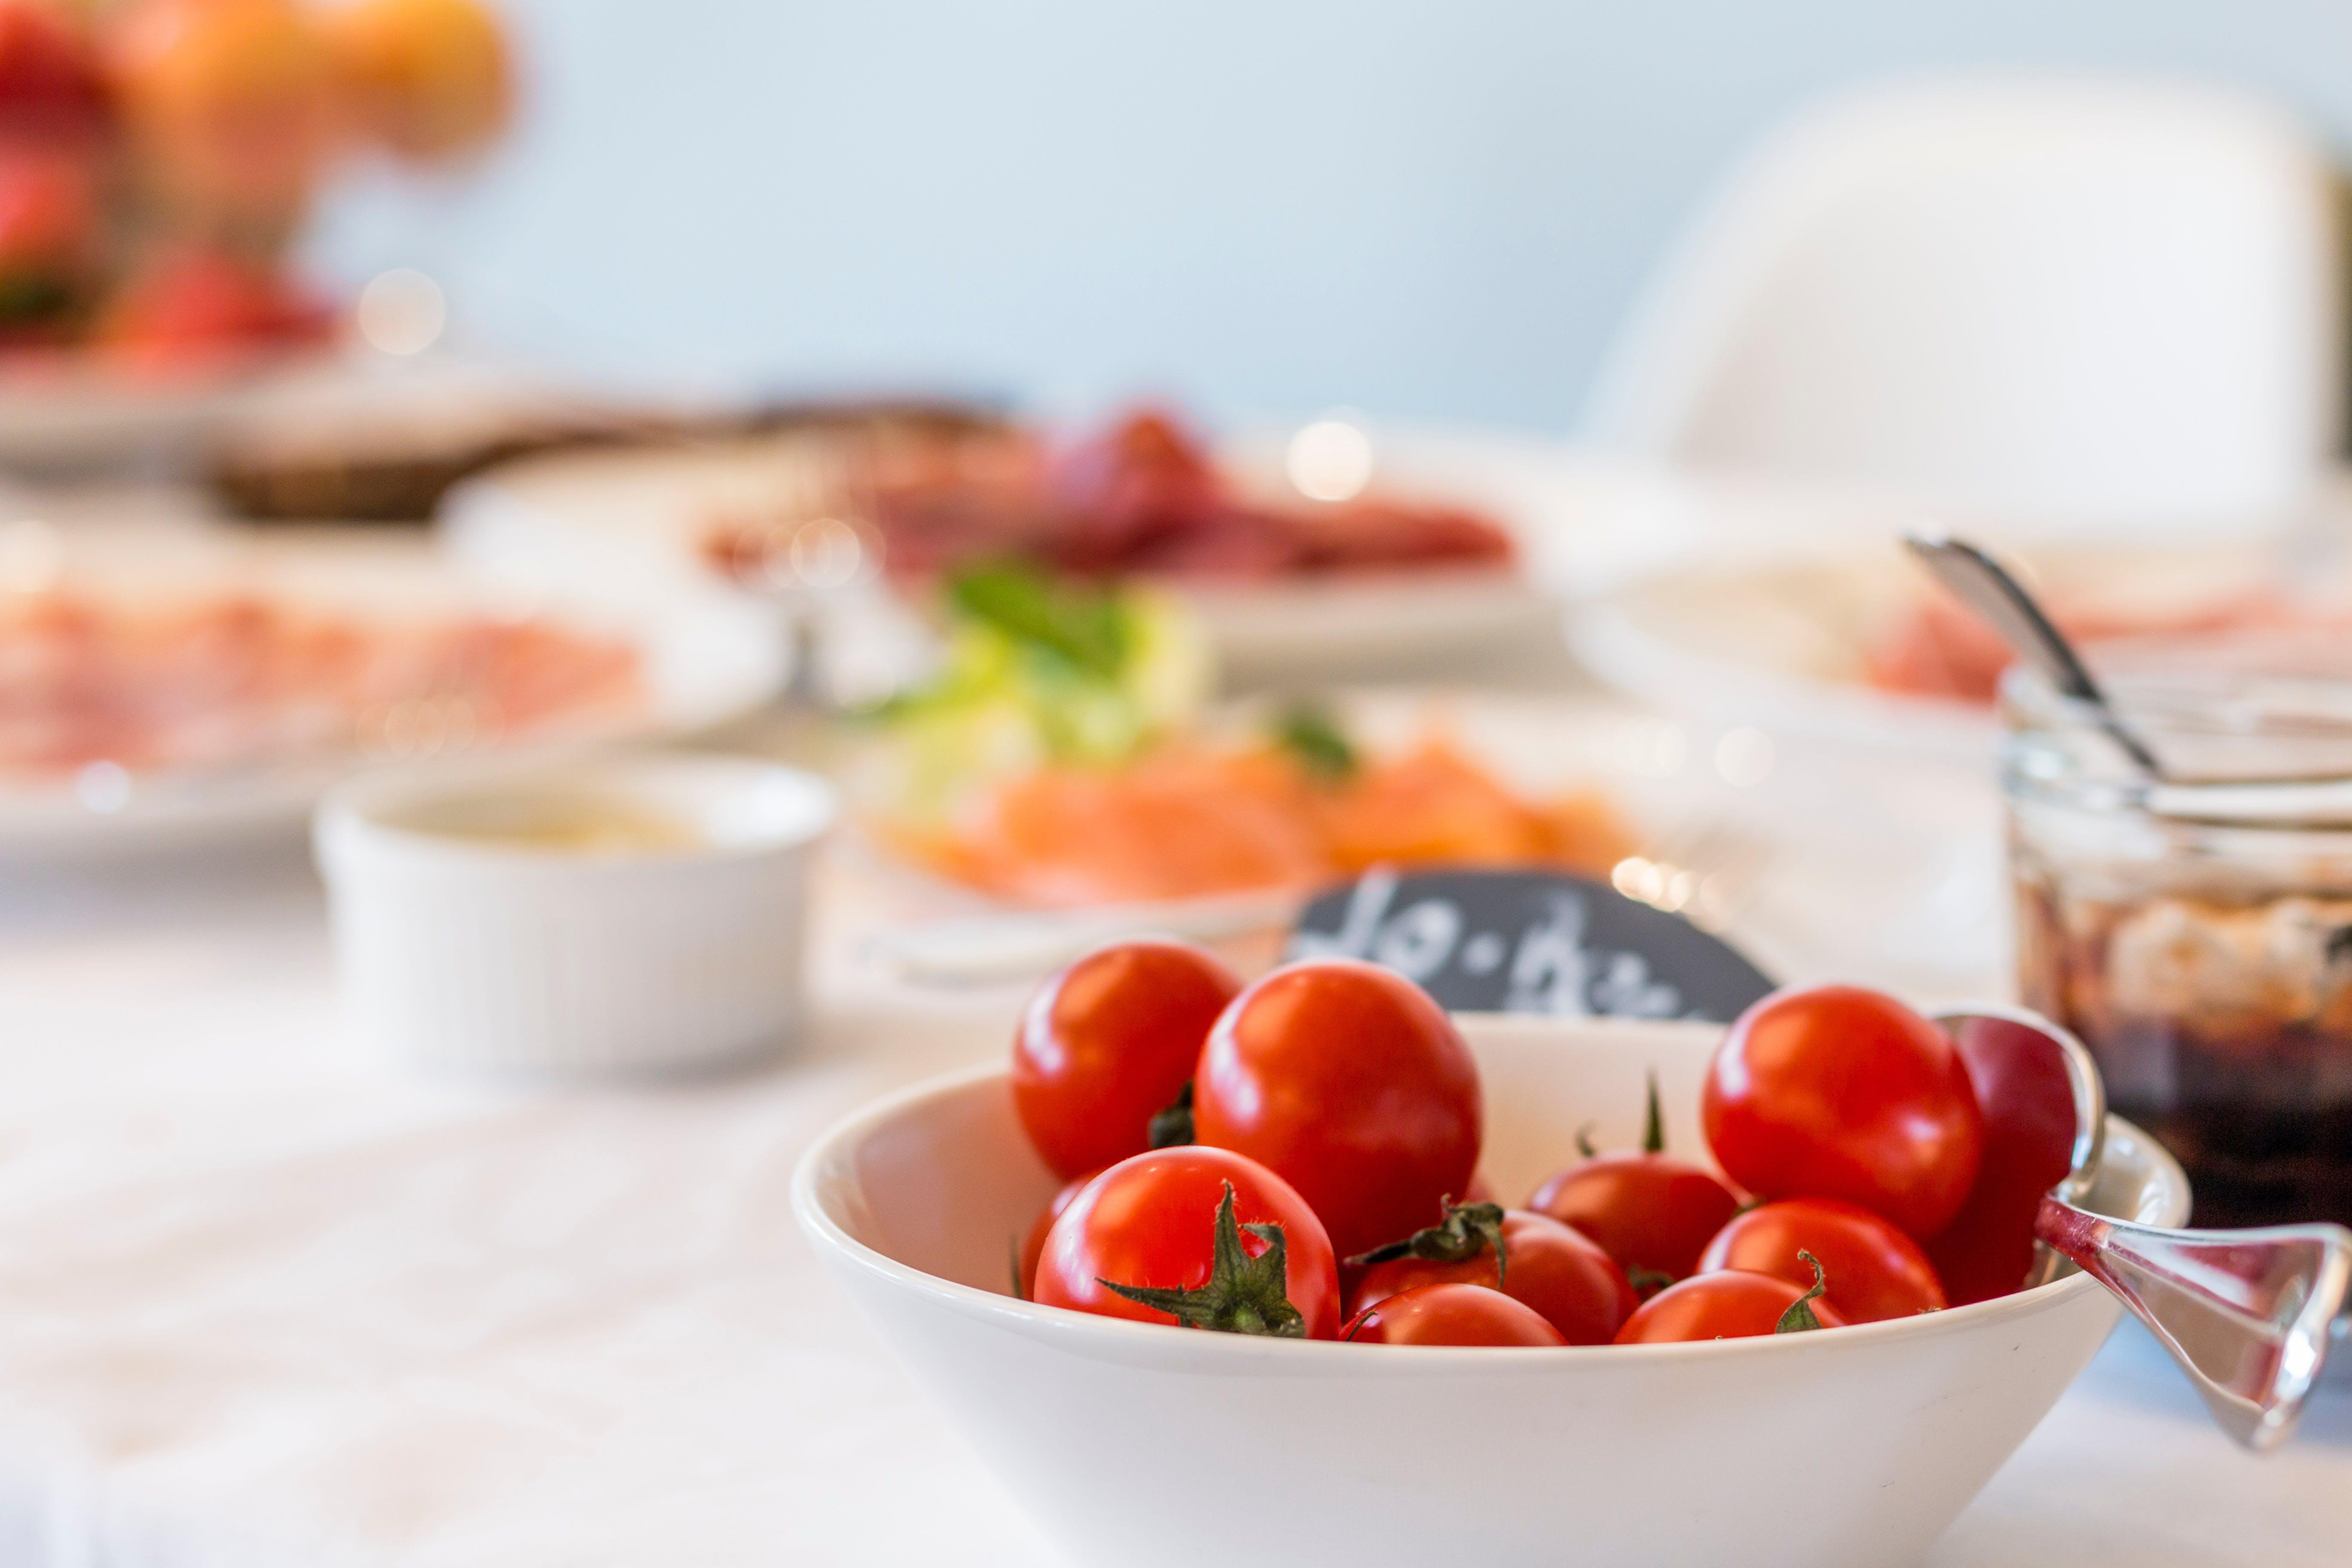 Kostenloses Stock Foto zu abendessen, essen, essenszubereitung, fokus